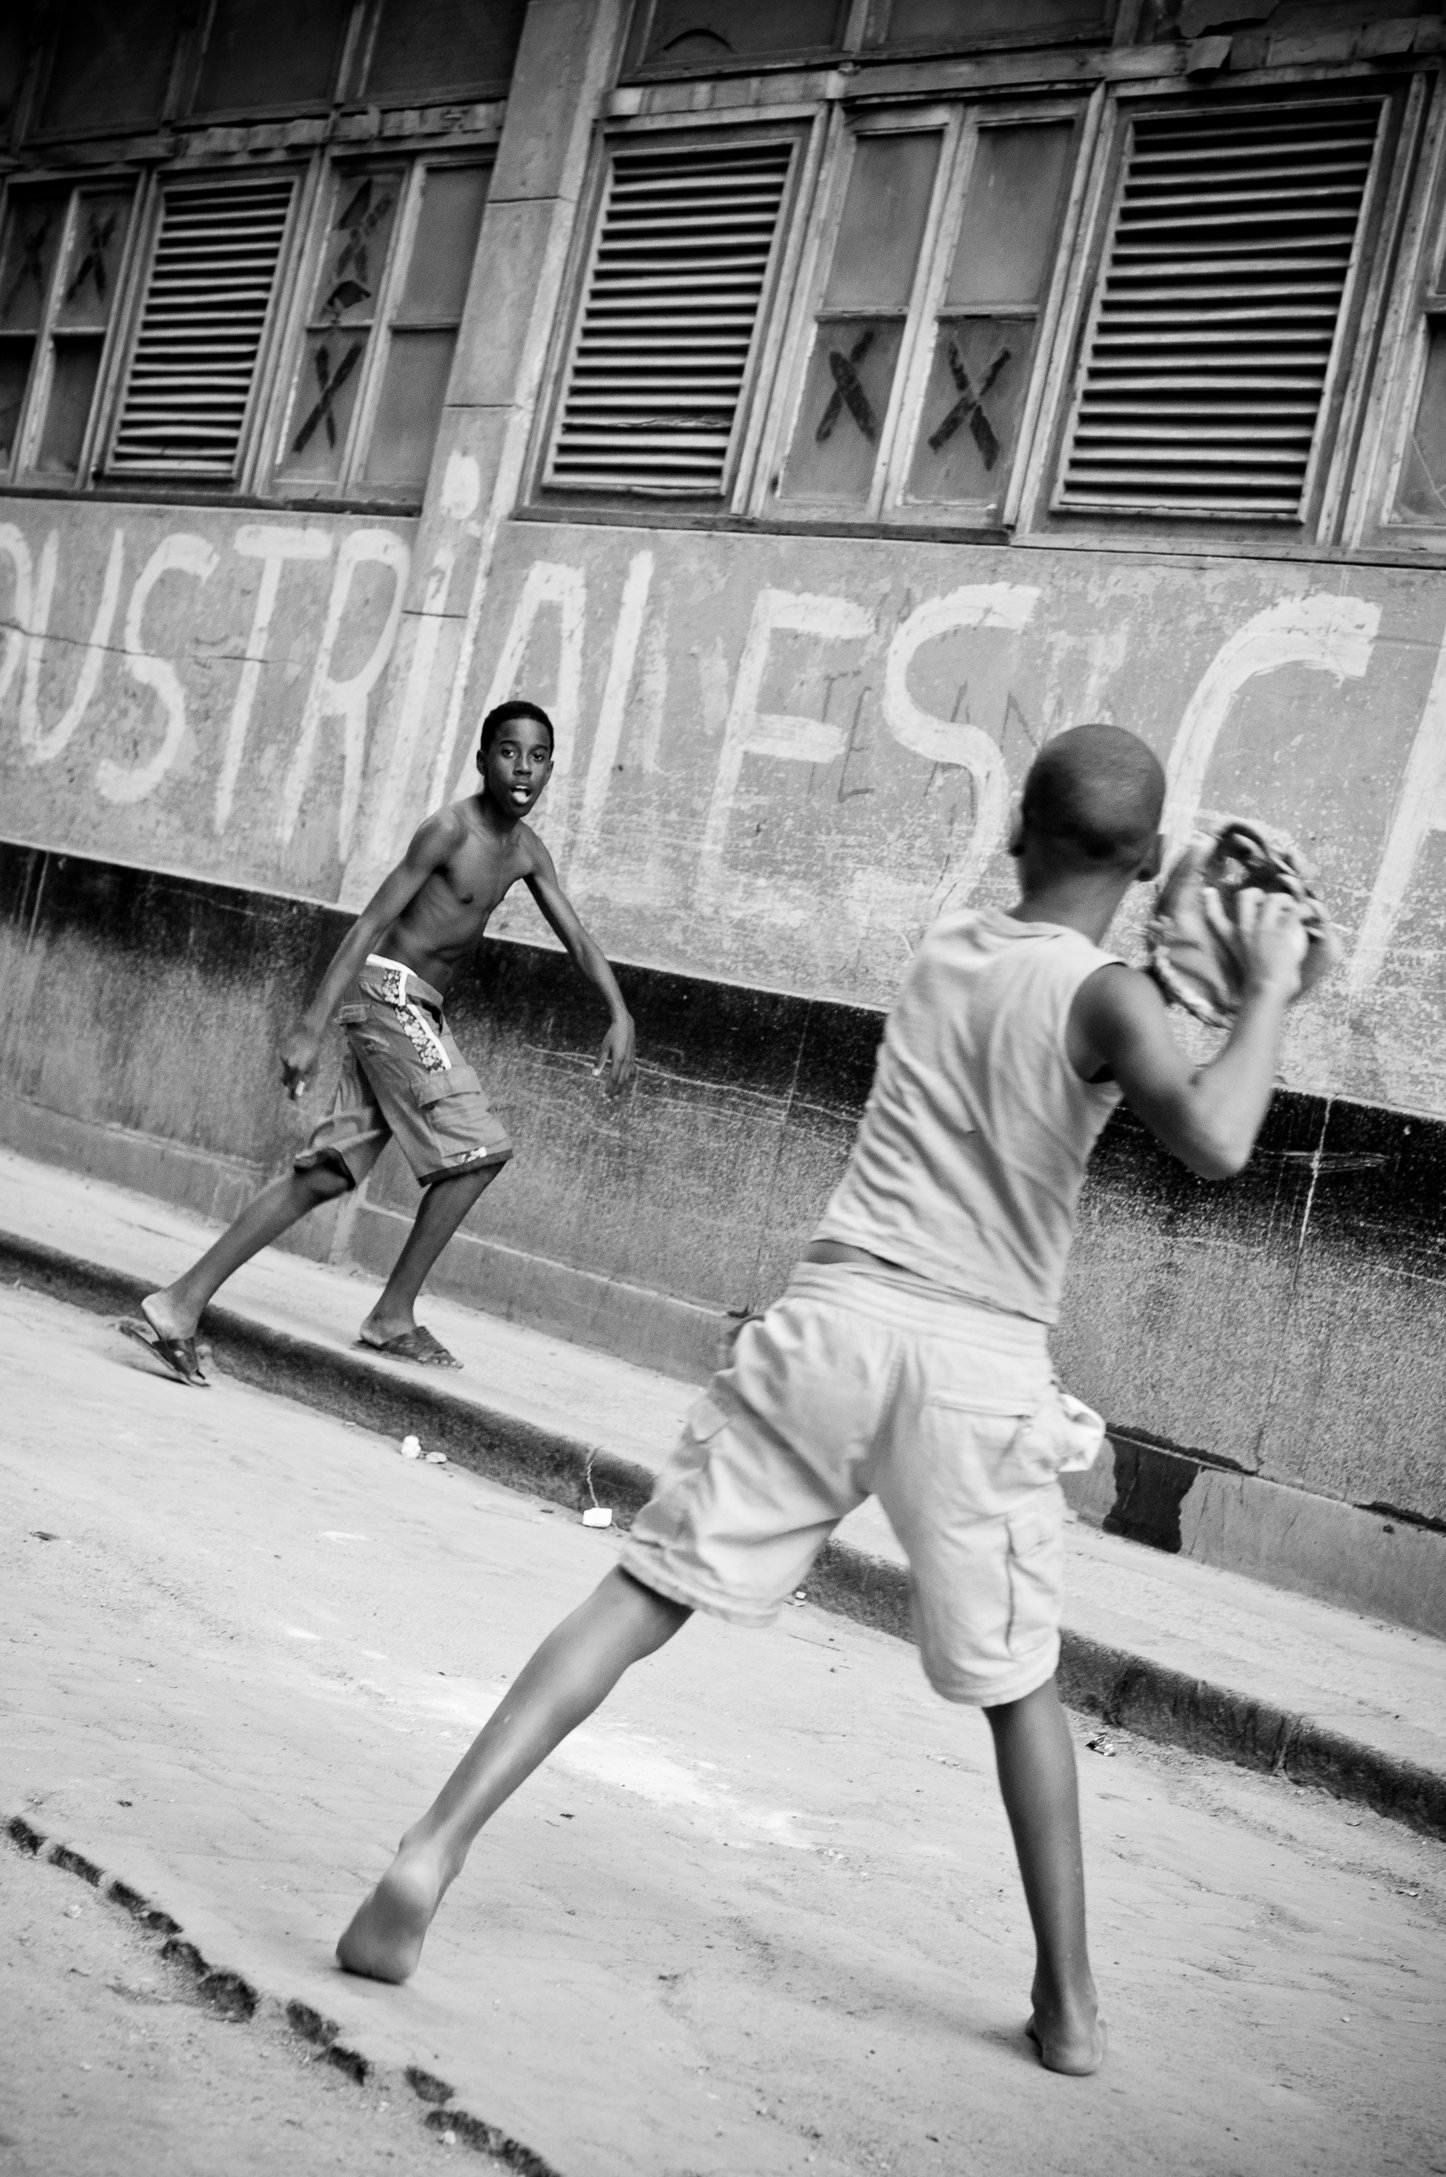 Baseball in Habana Vieja, Cuba 2010